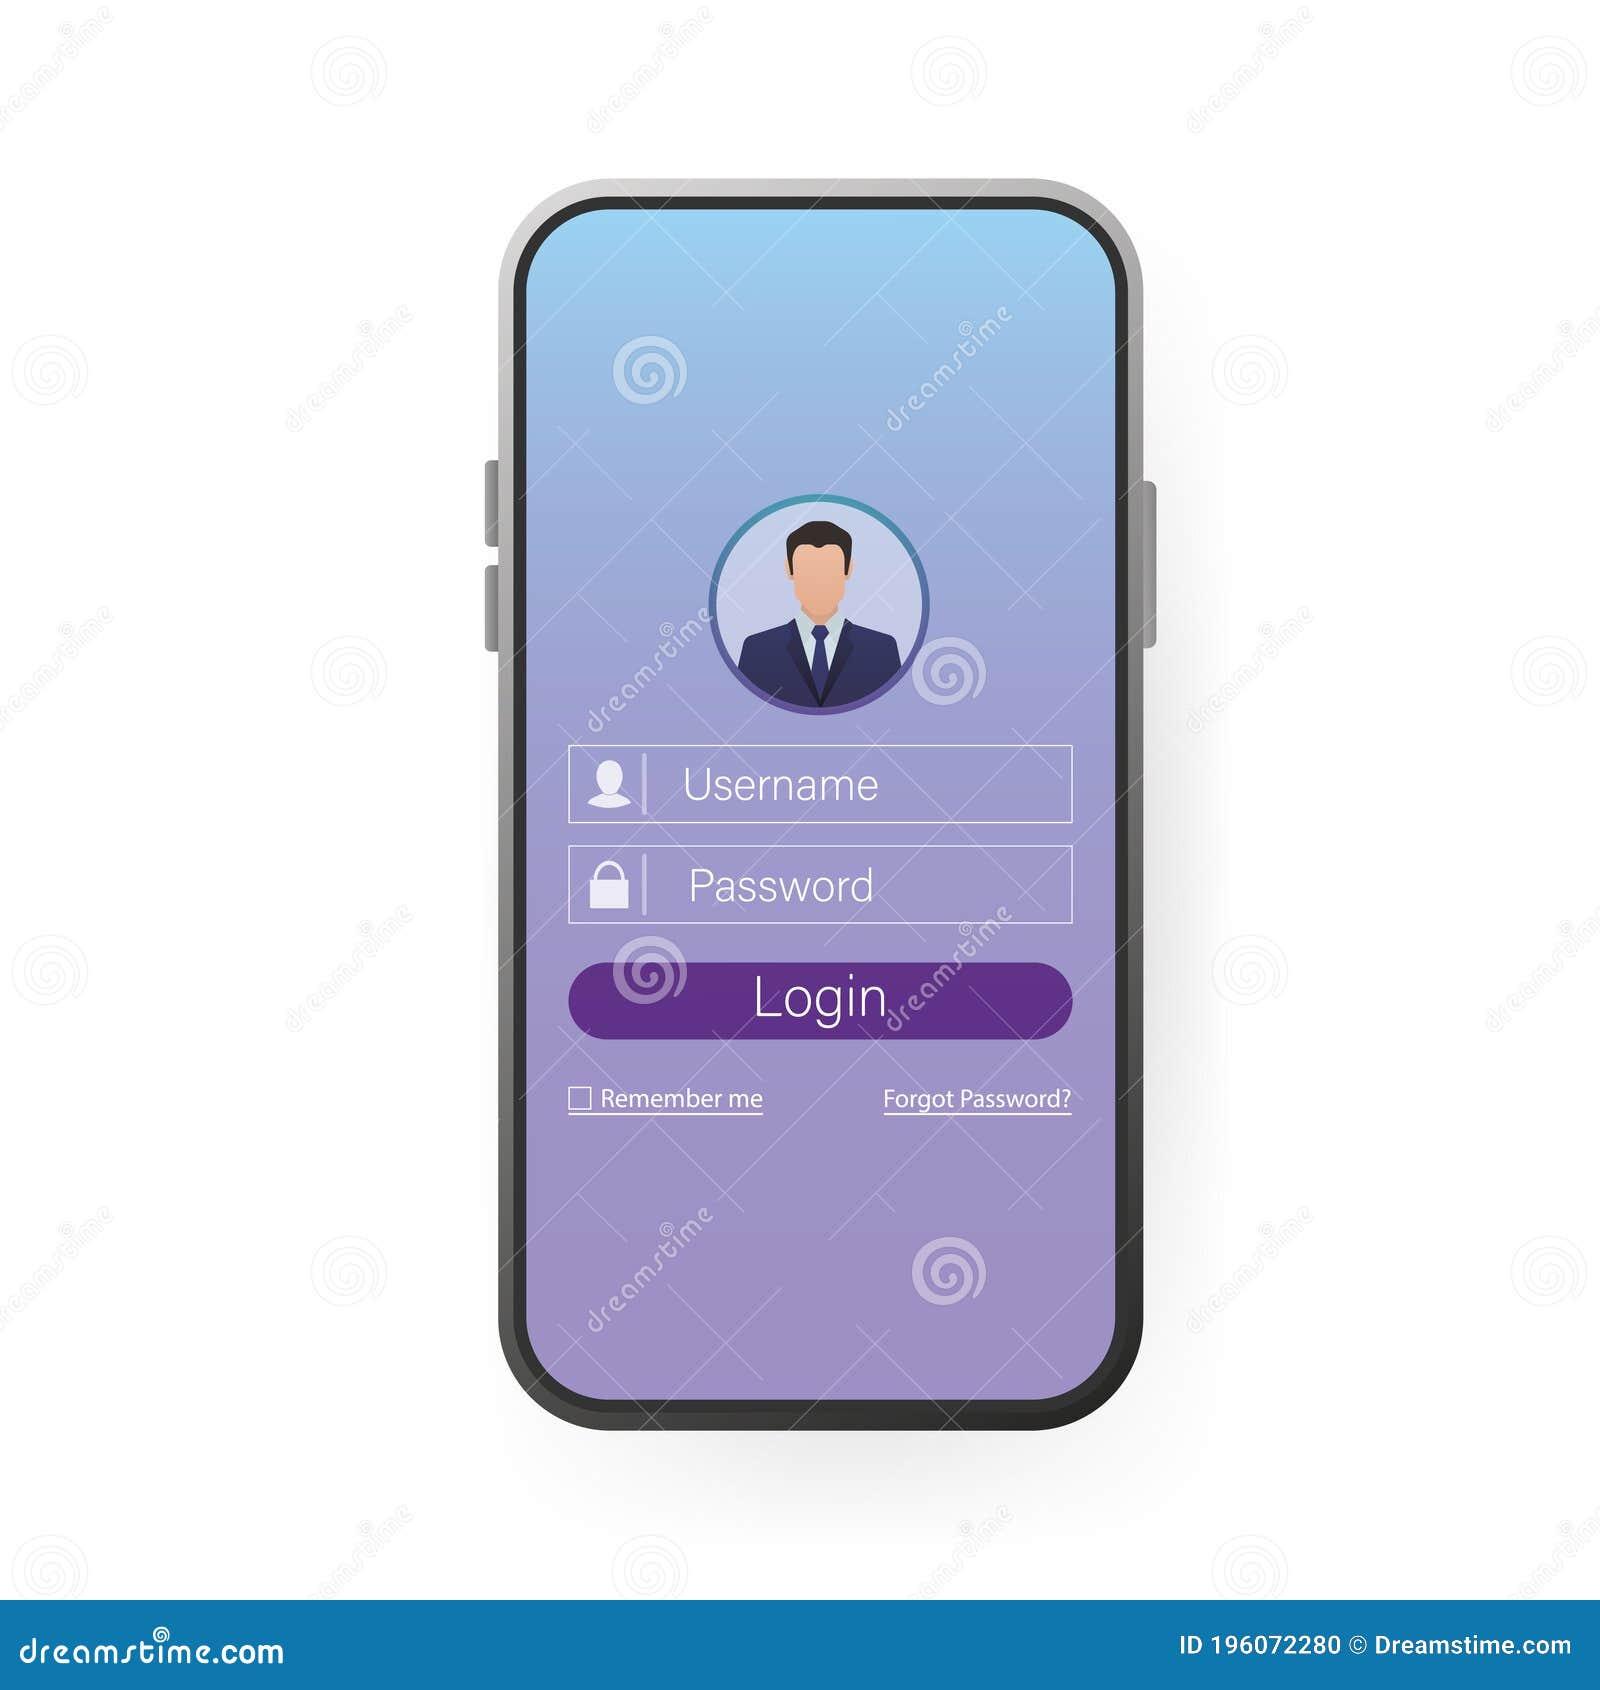 Me login mobile MobileMe